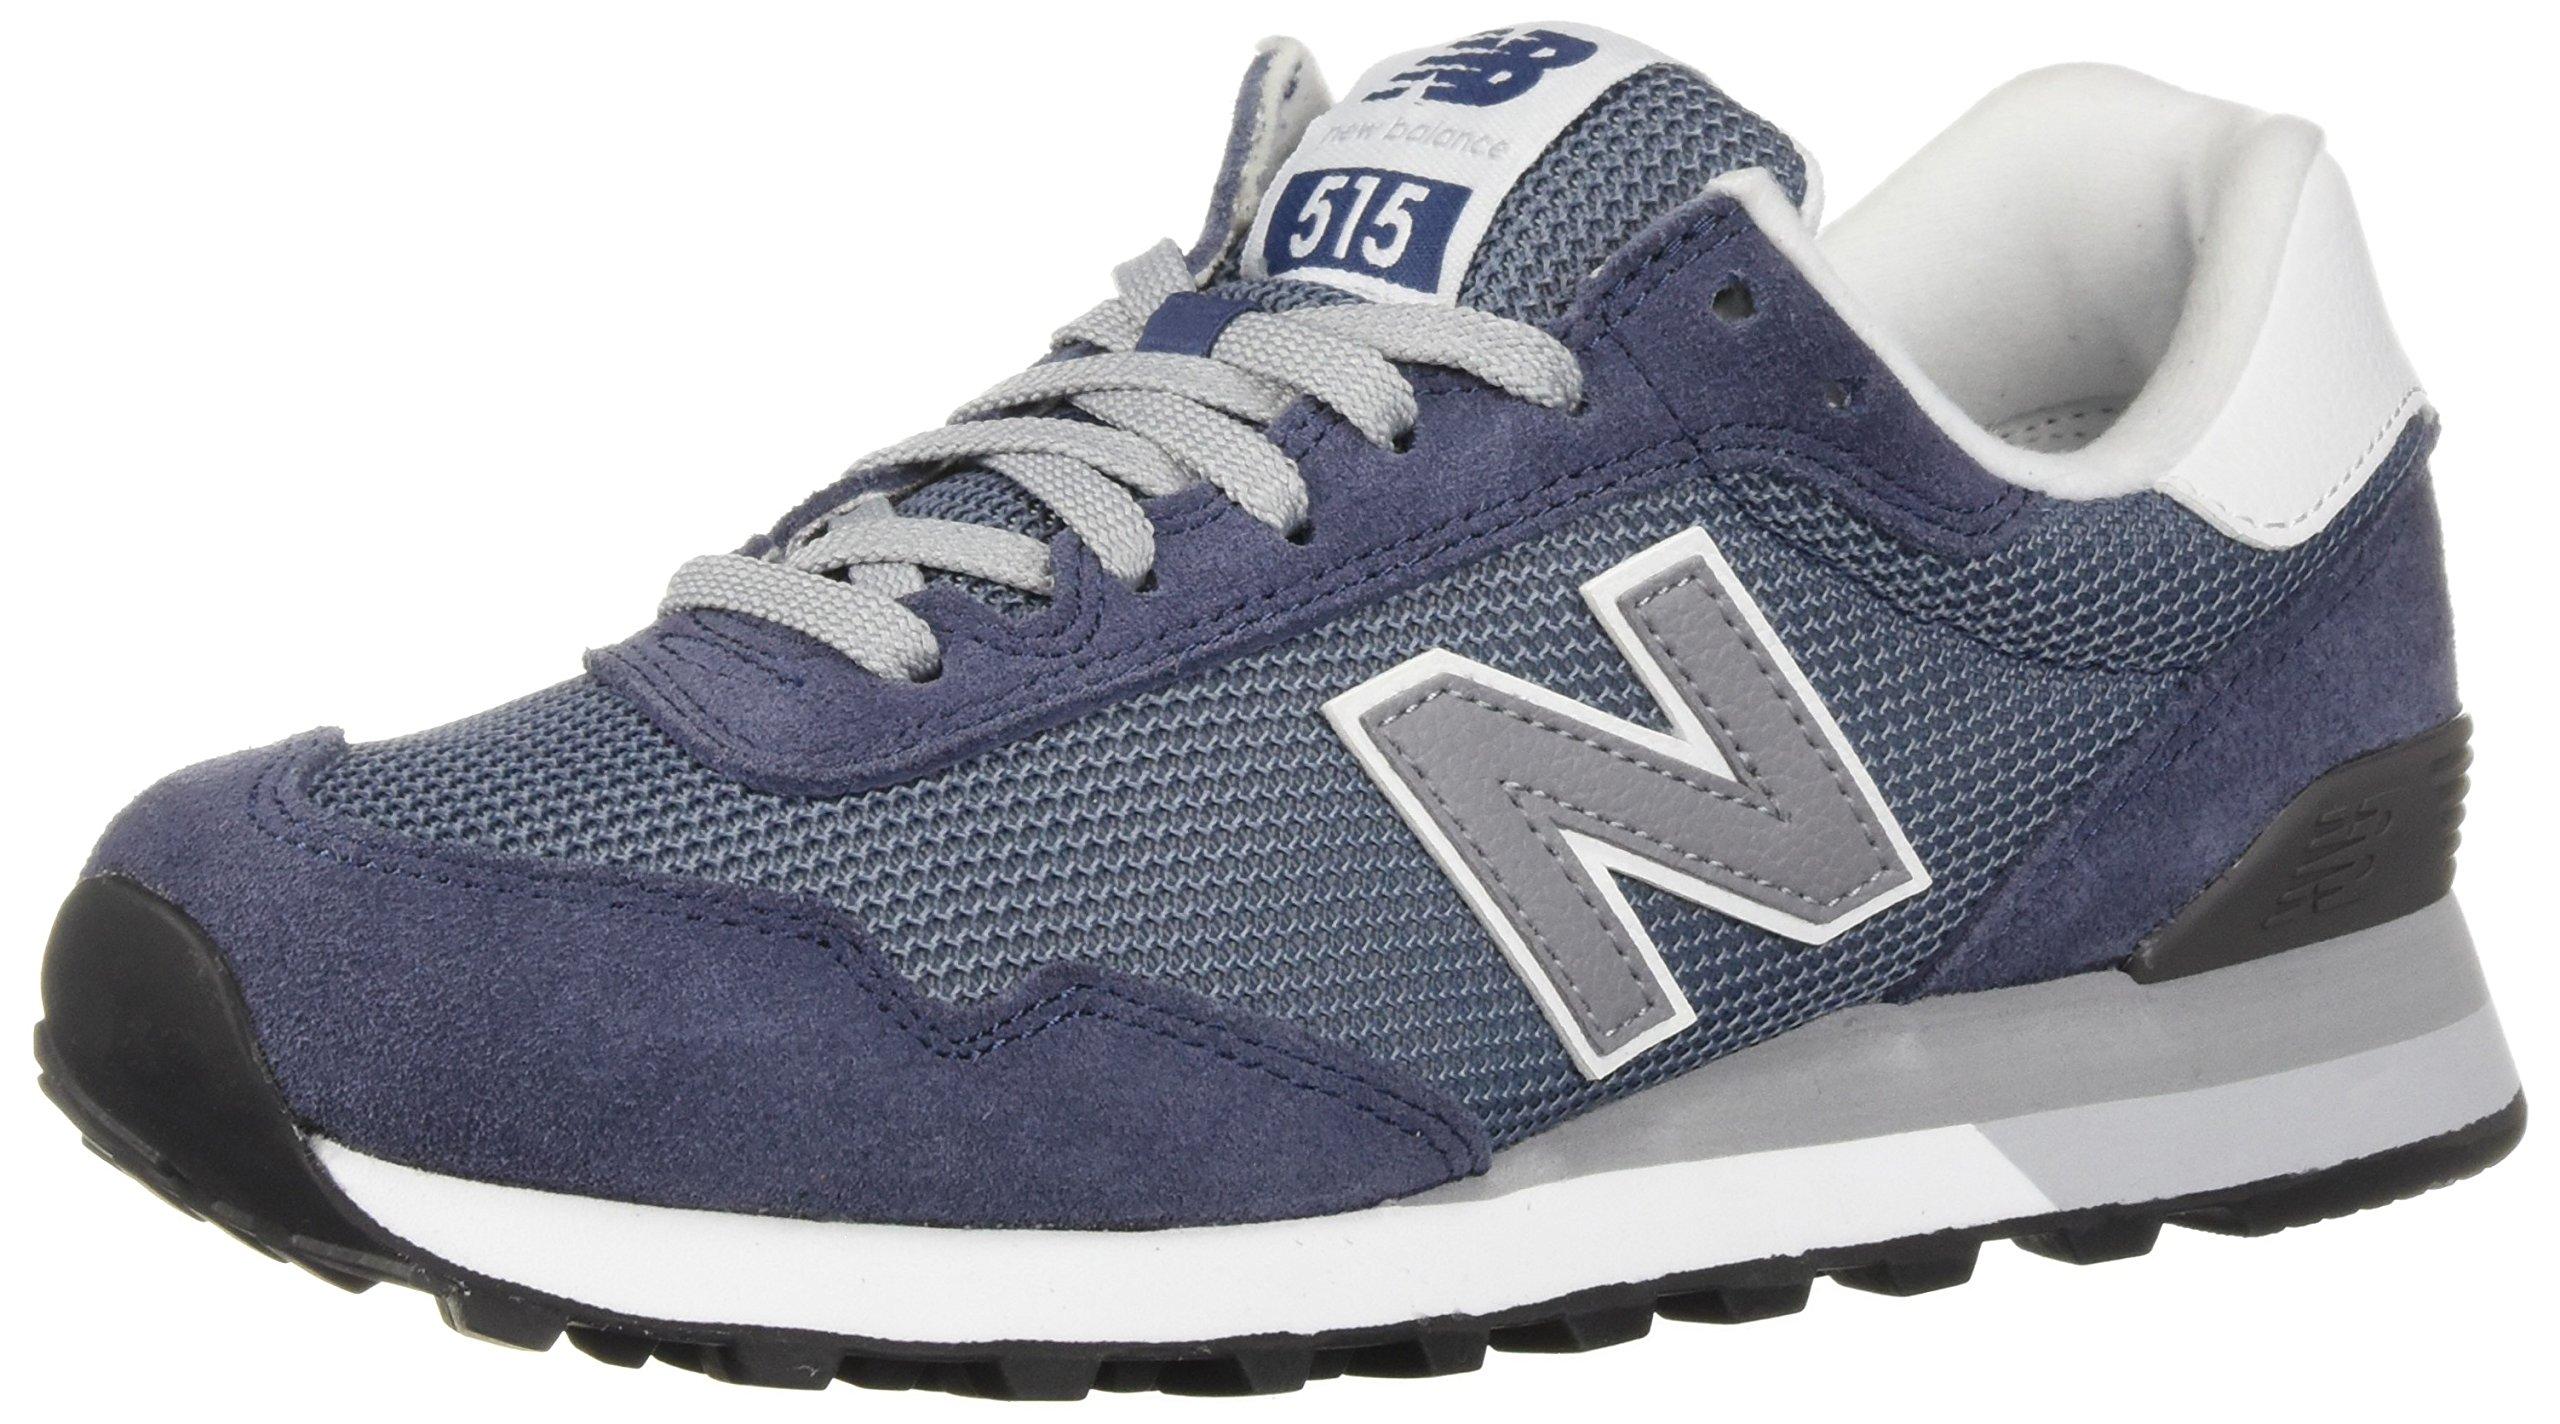 New Balance Men's 515 V1 Sneaker, Vintage Indigo/Silver Mink, 18 4E US